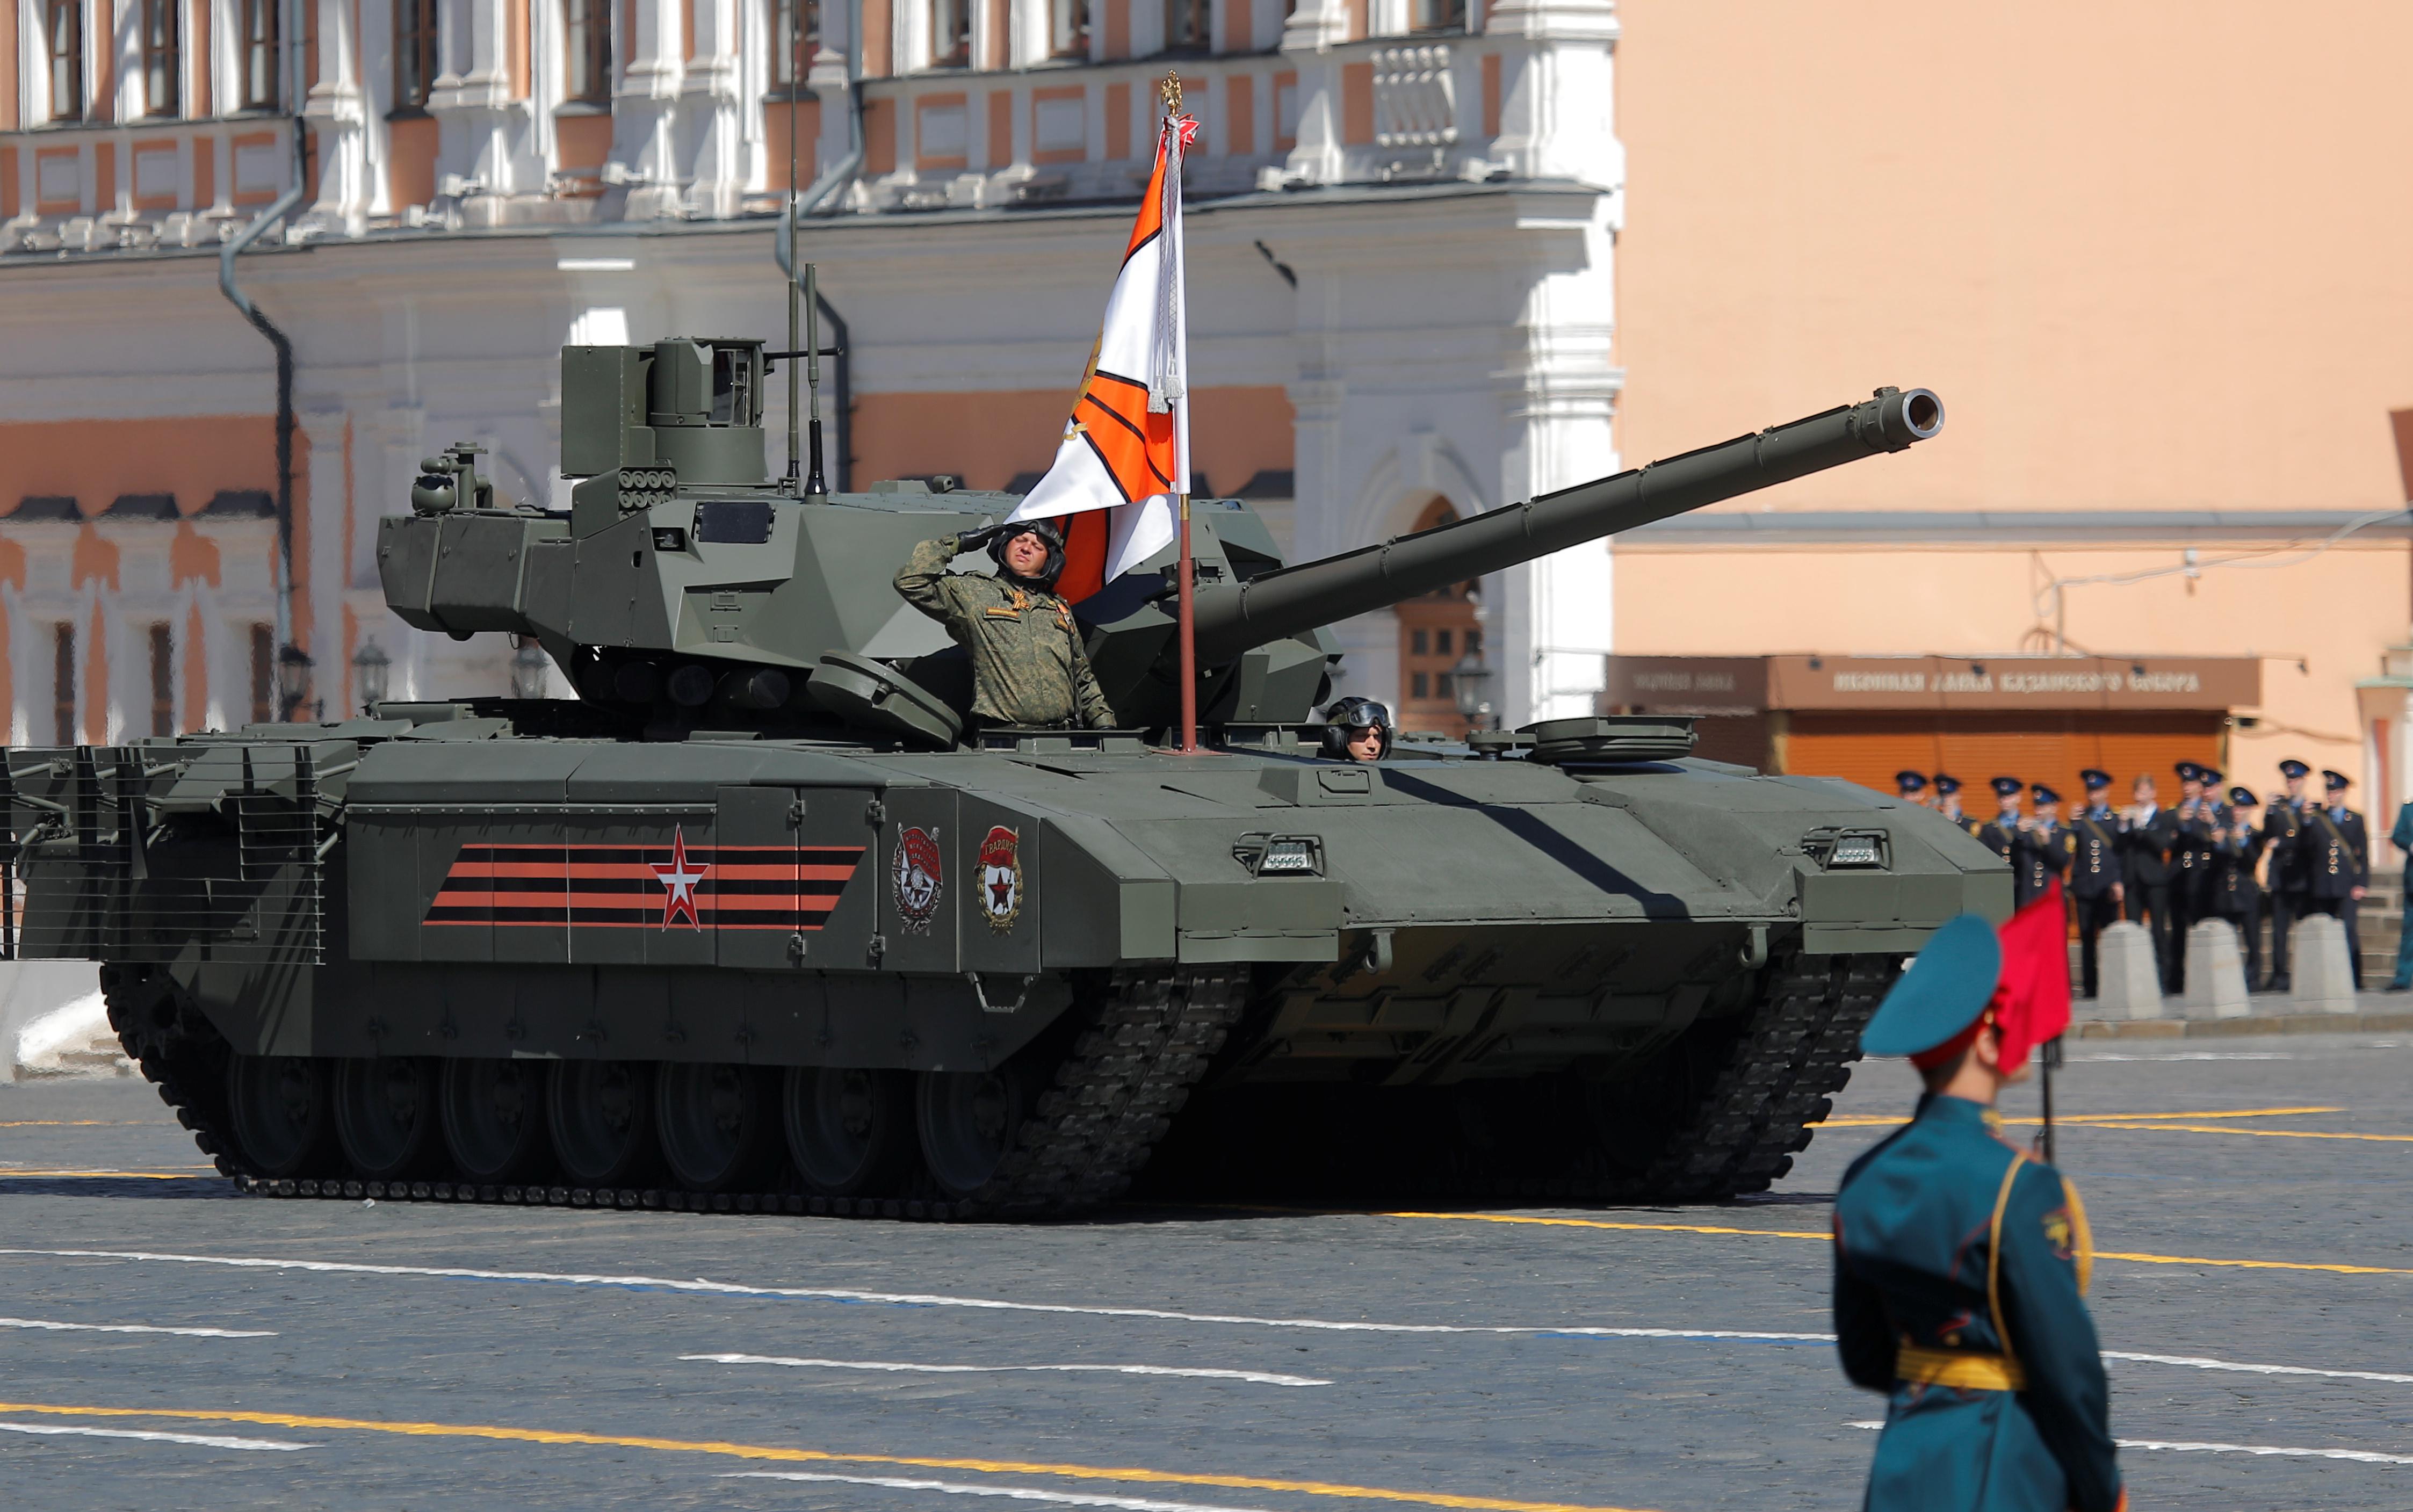 russia 39 s new armata t 14 tank has a secret weapon the. Black Bedroom Furniture Sets. Home Design Ideas